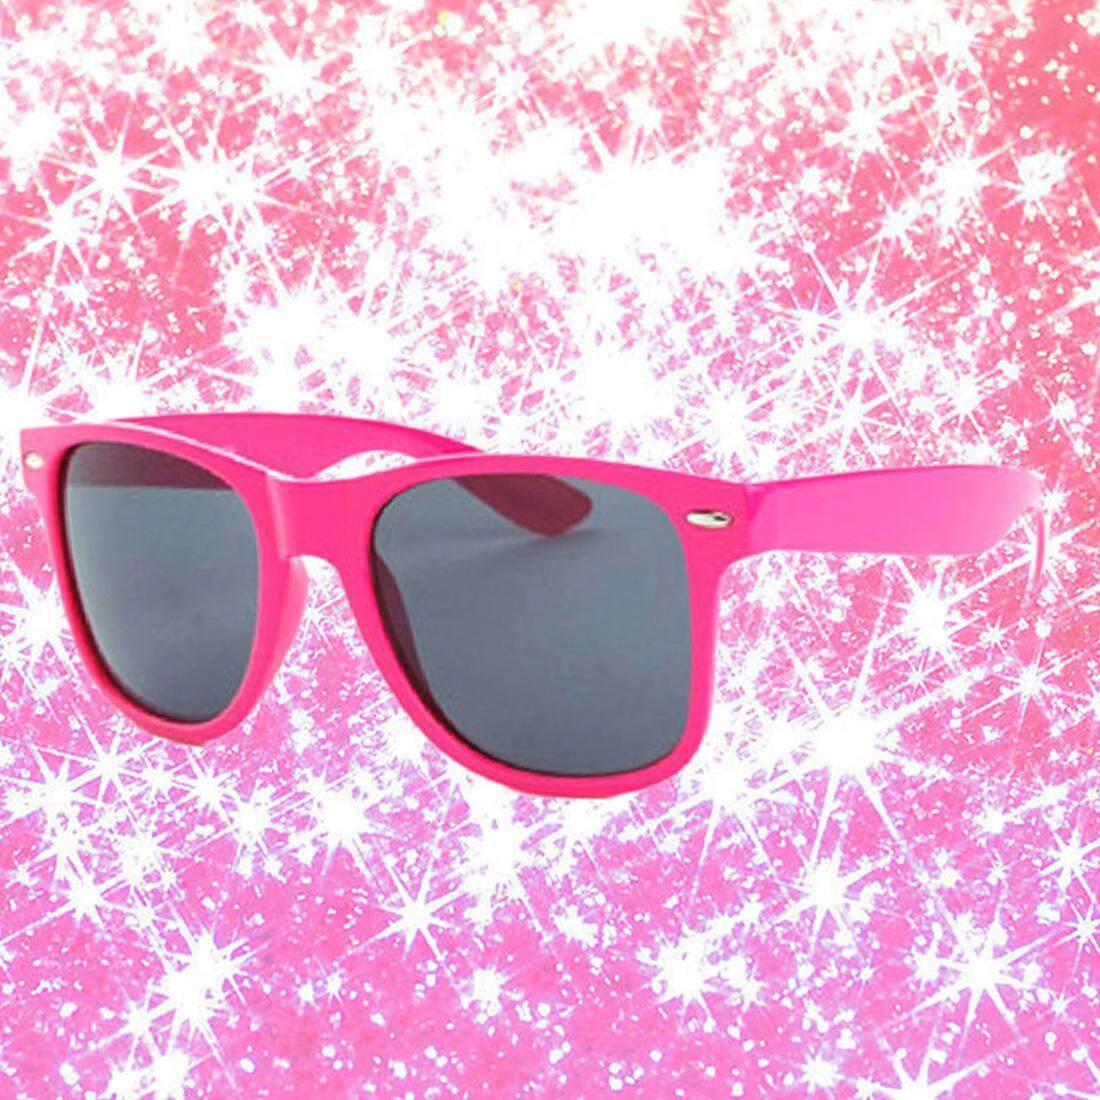 b37f3ab0a8e Girl Boy Sunglass Fashion Brand Sunglasses Man And Woman Black Sun Glasses  Hot Anti-uv